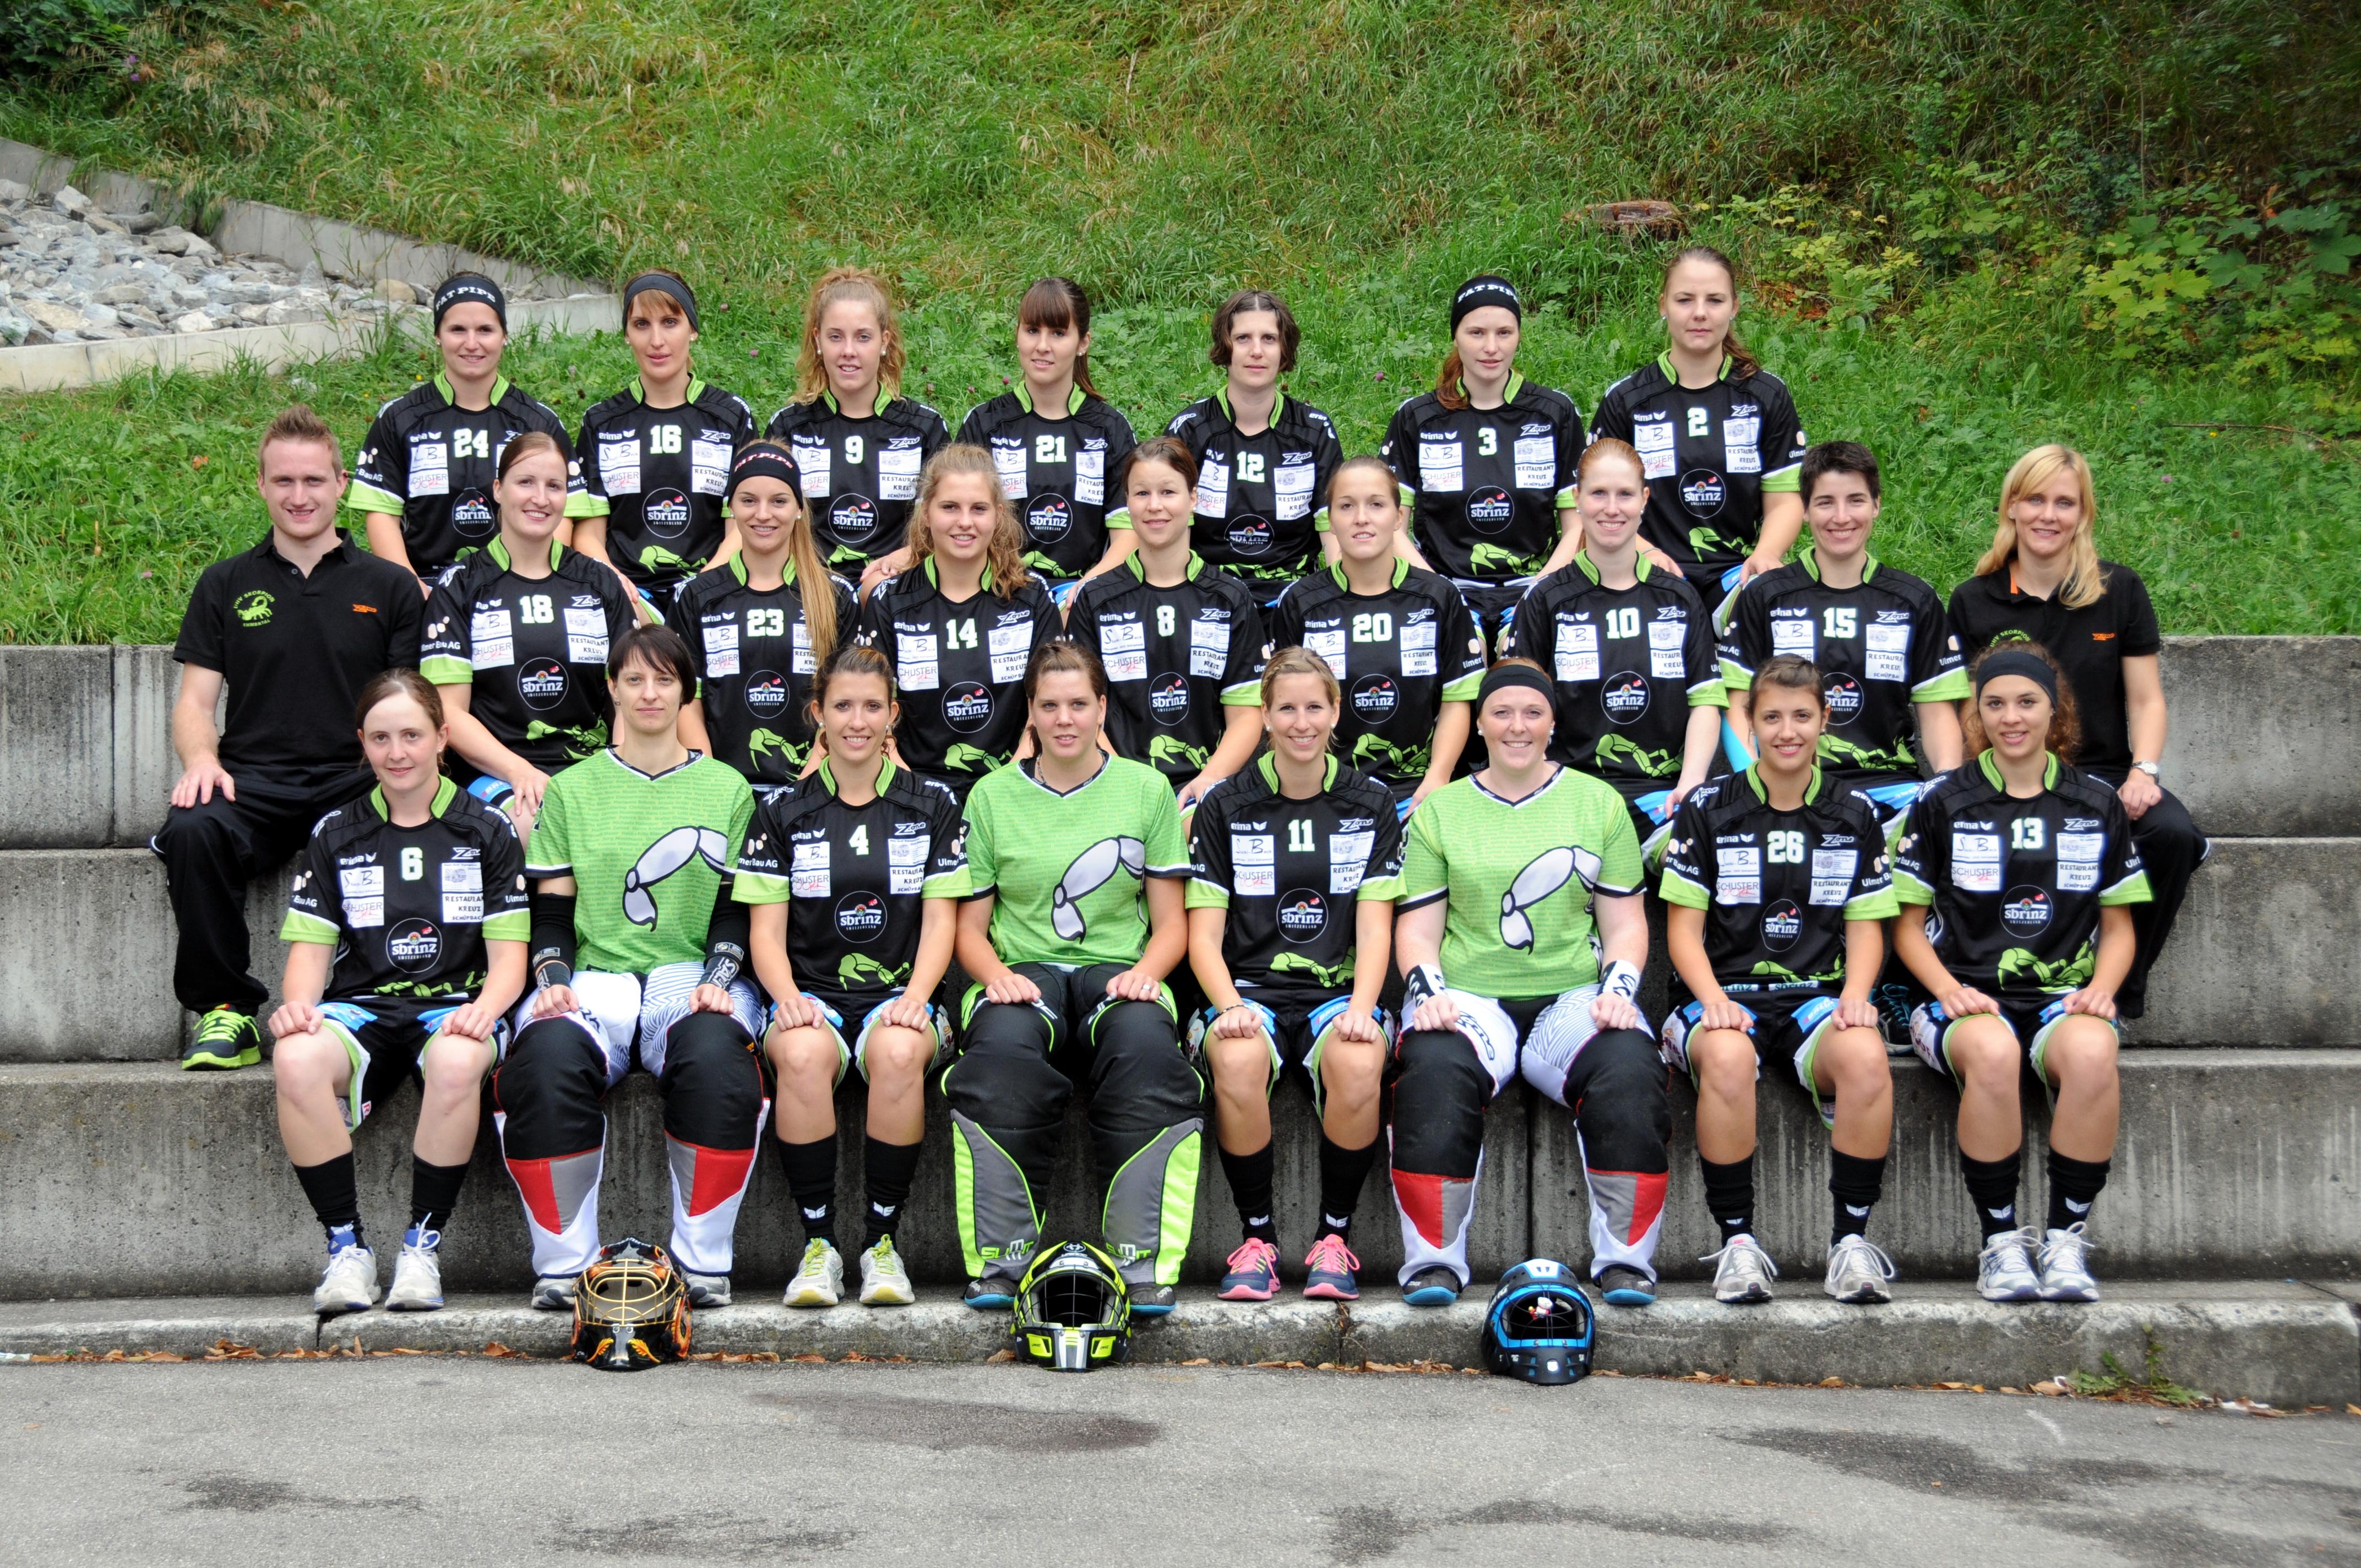 1.Liga Portrait 2013/2014